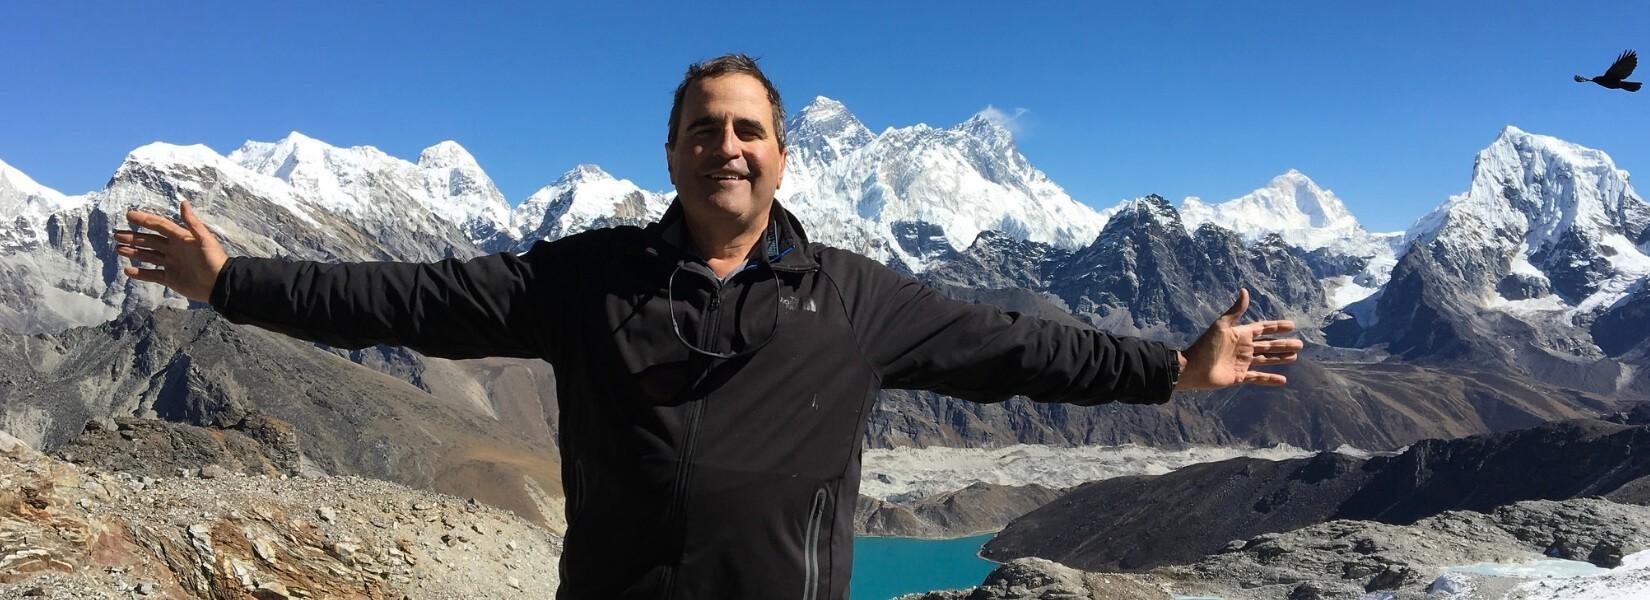 Top 9 reason why should do Everest Base Camp Trek